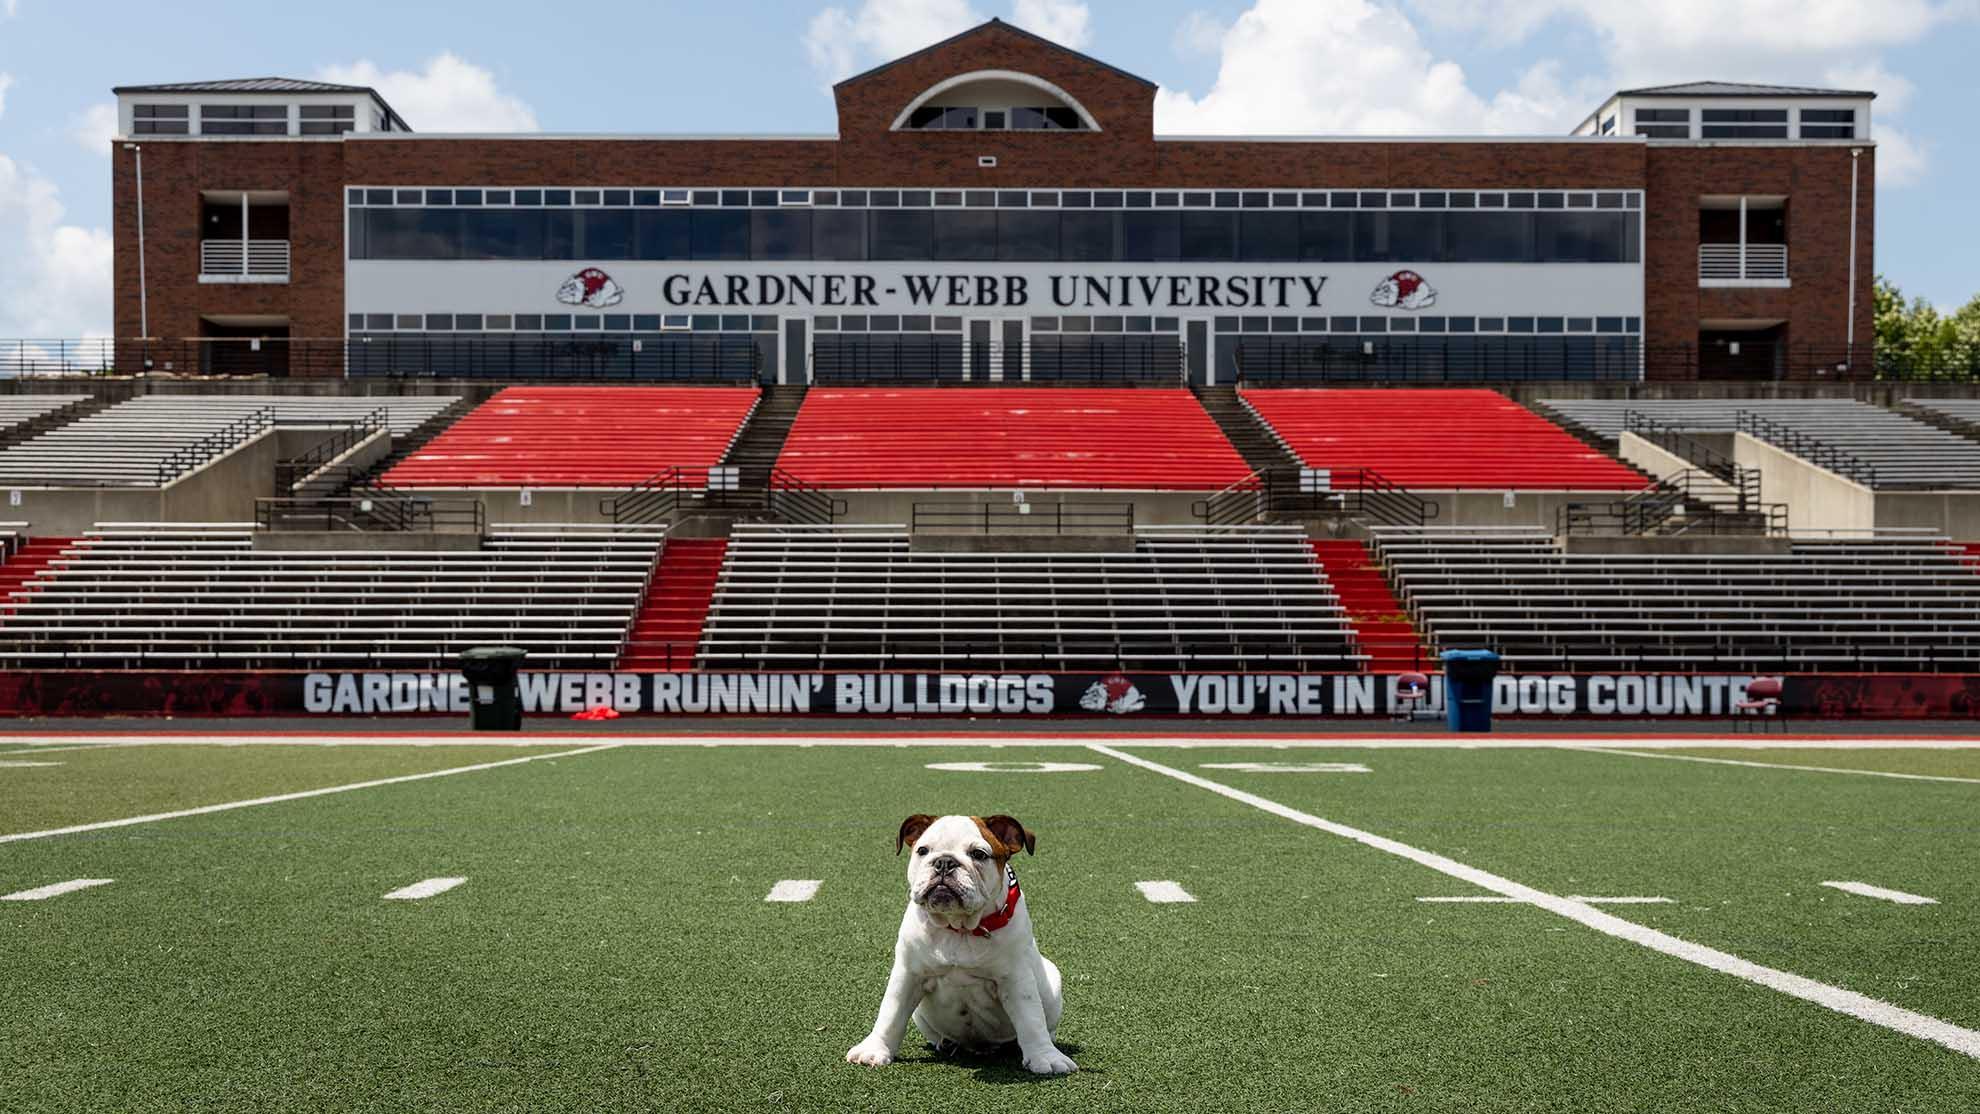 Bo the Bulldog in the football stadium